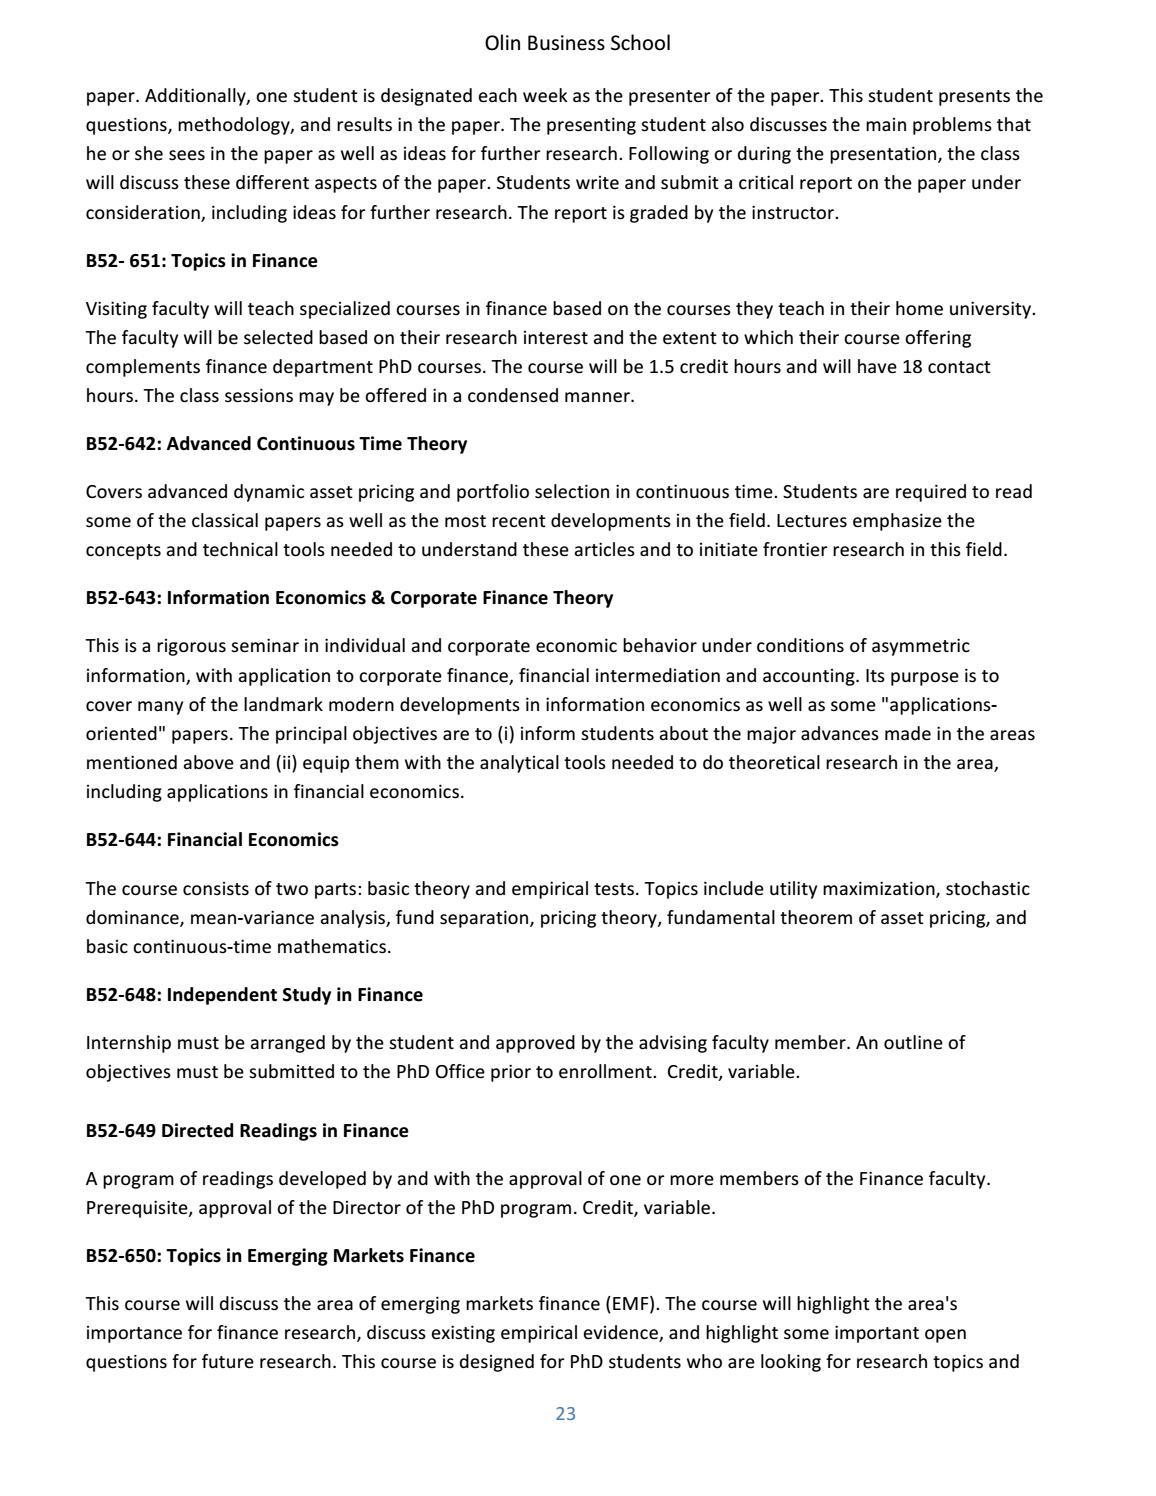 corporate finance topics research paper